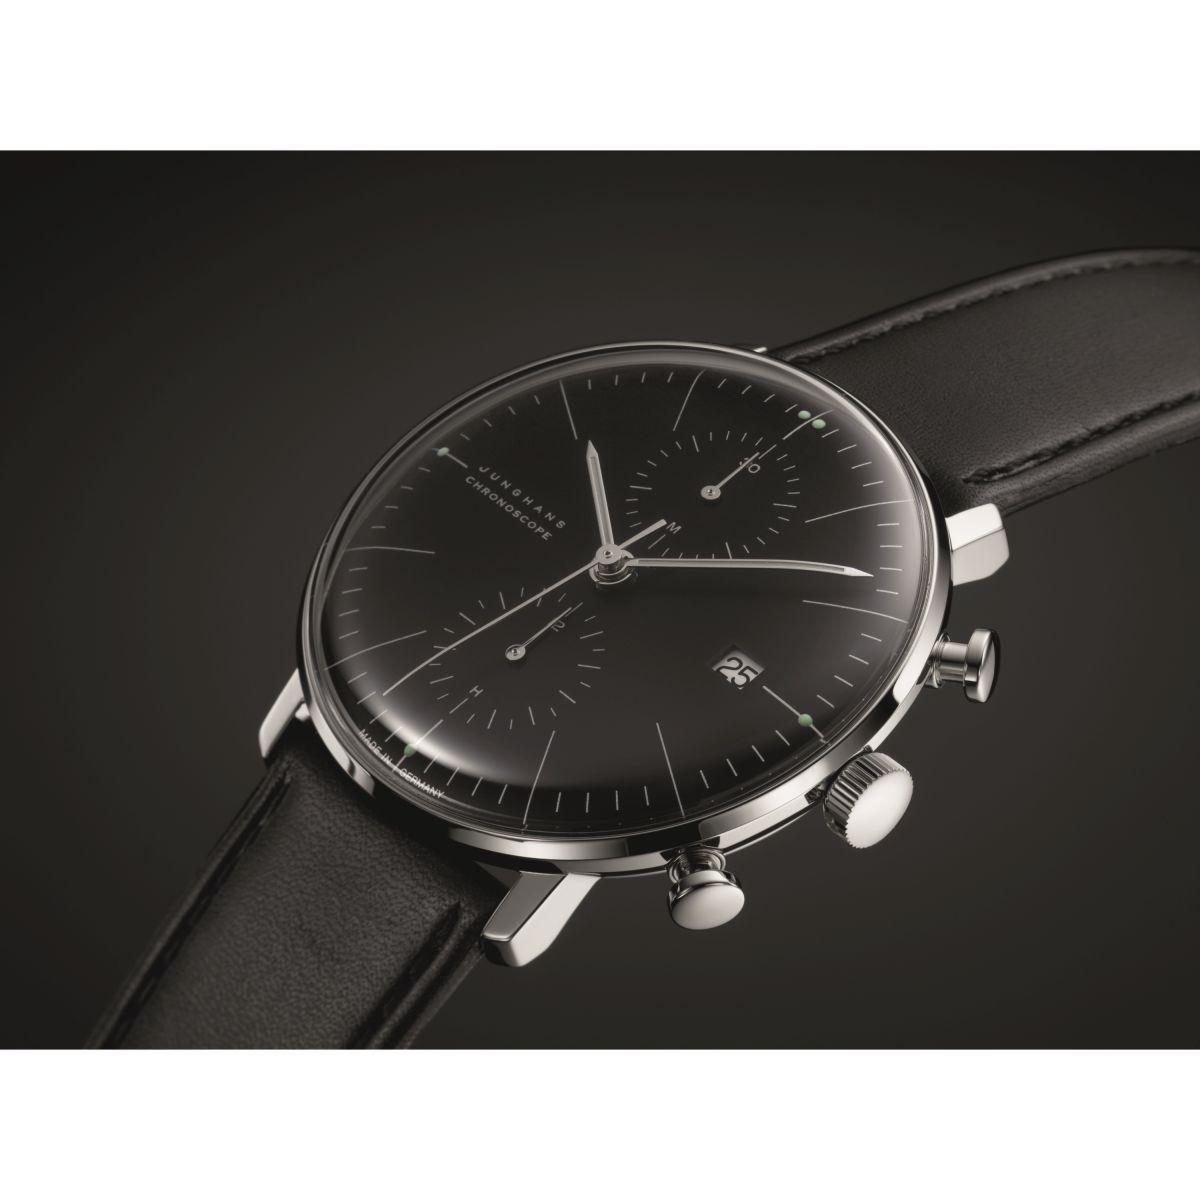 gents junghans max bill chronoscope chronograph watch 027. Black Bedroom Furniture Sets. Home Design Ideas